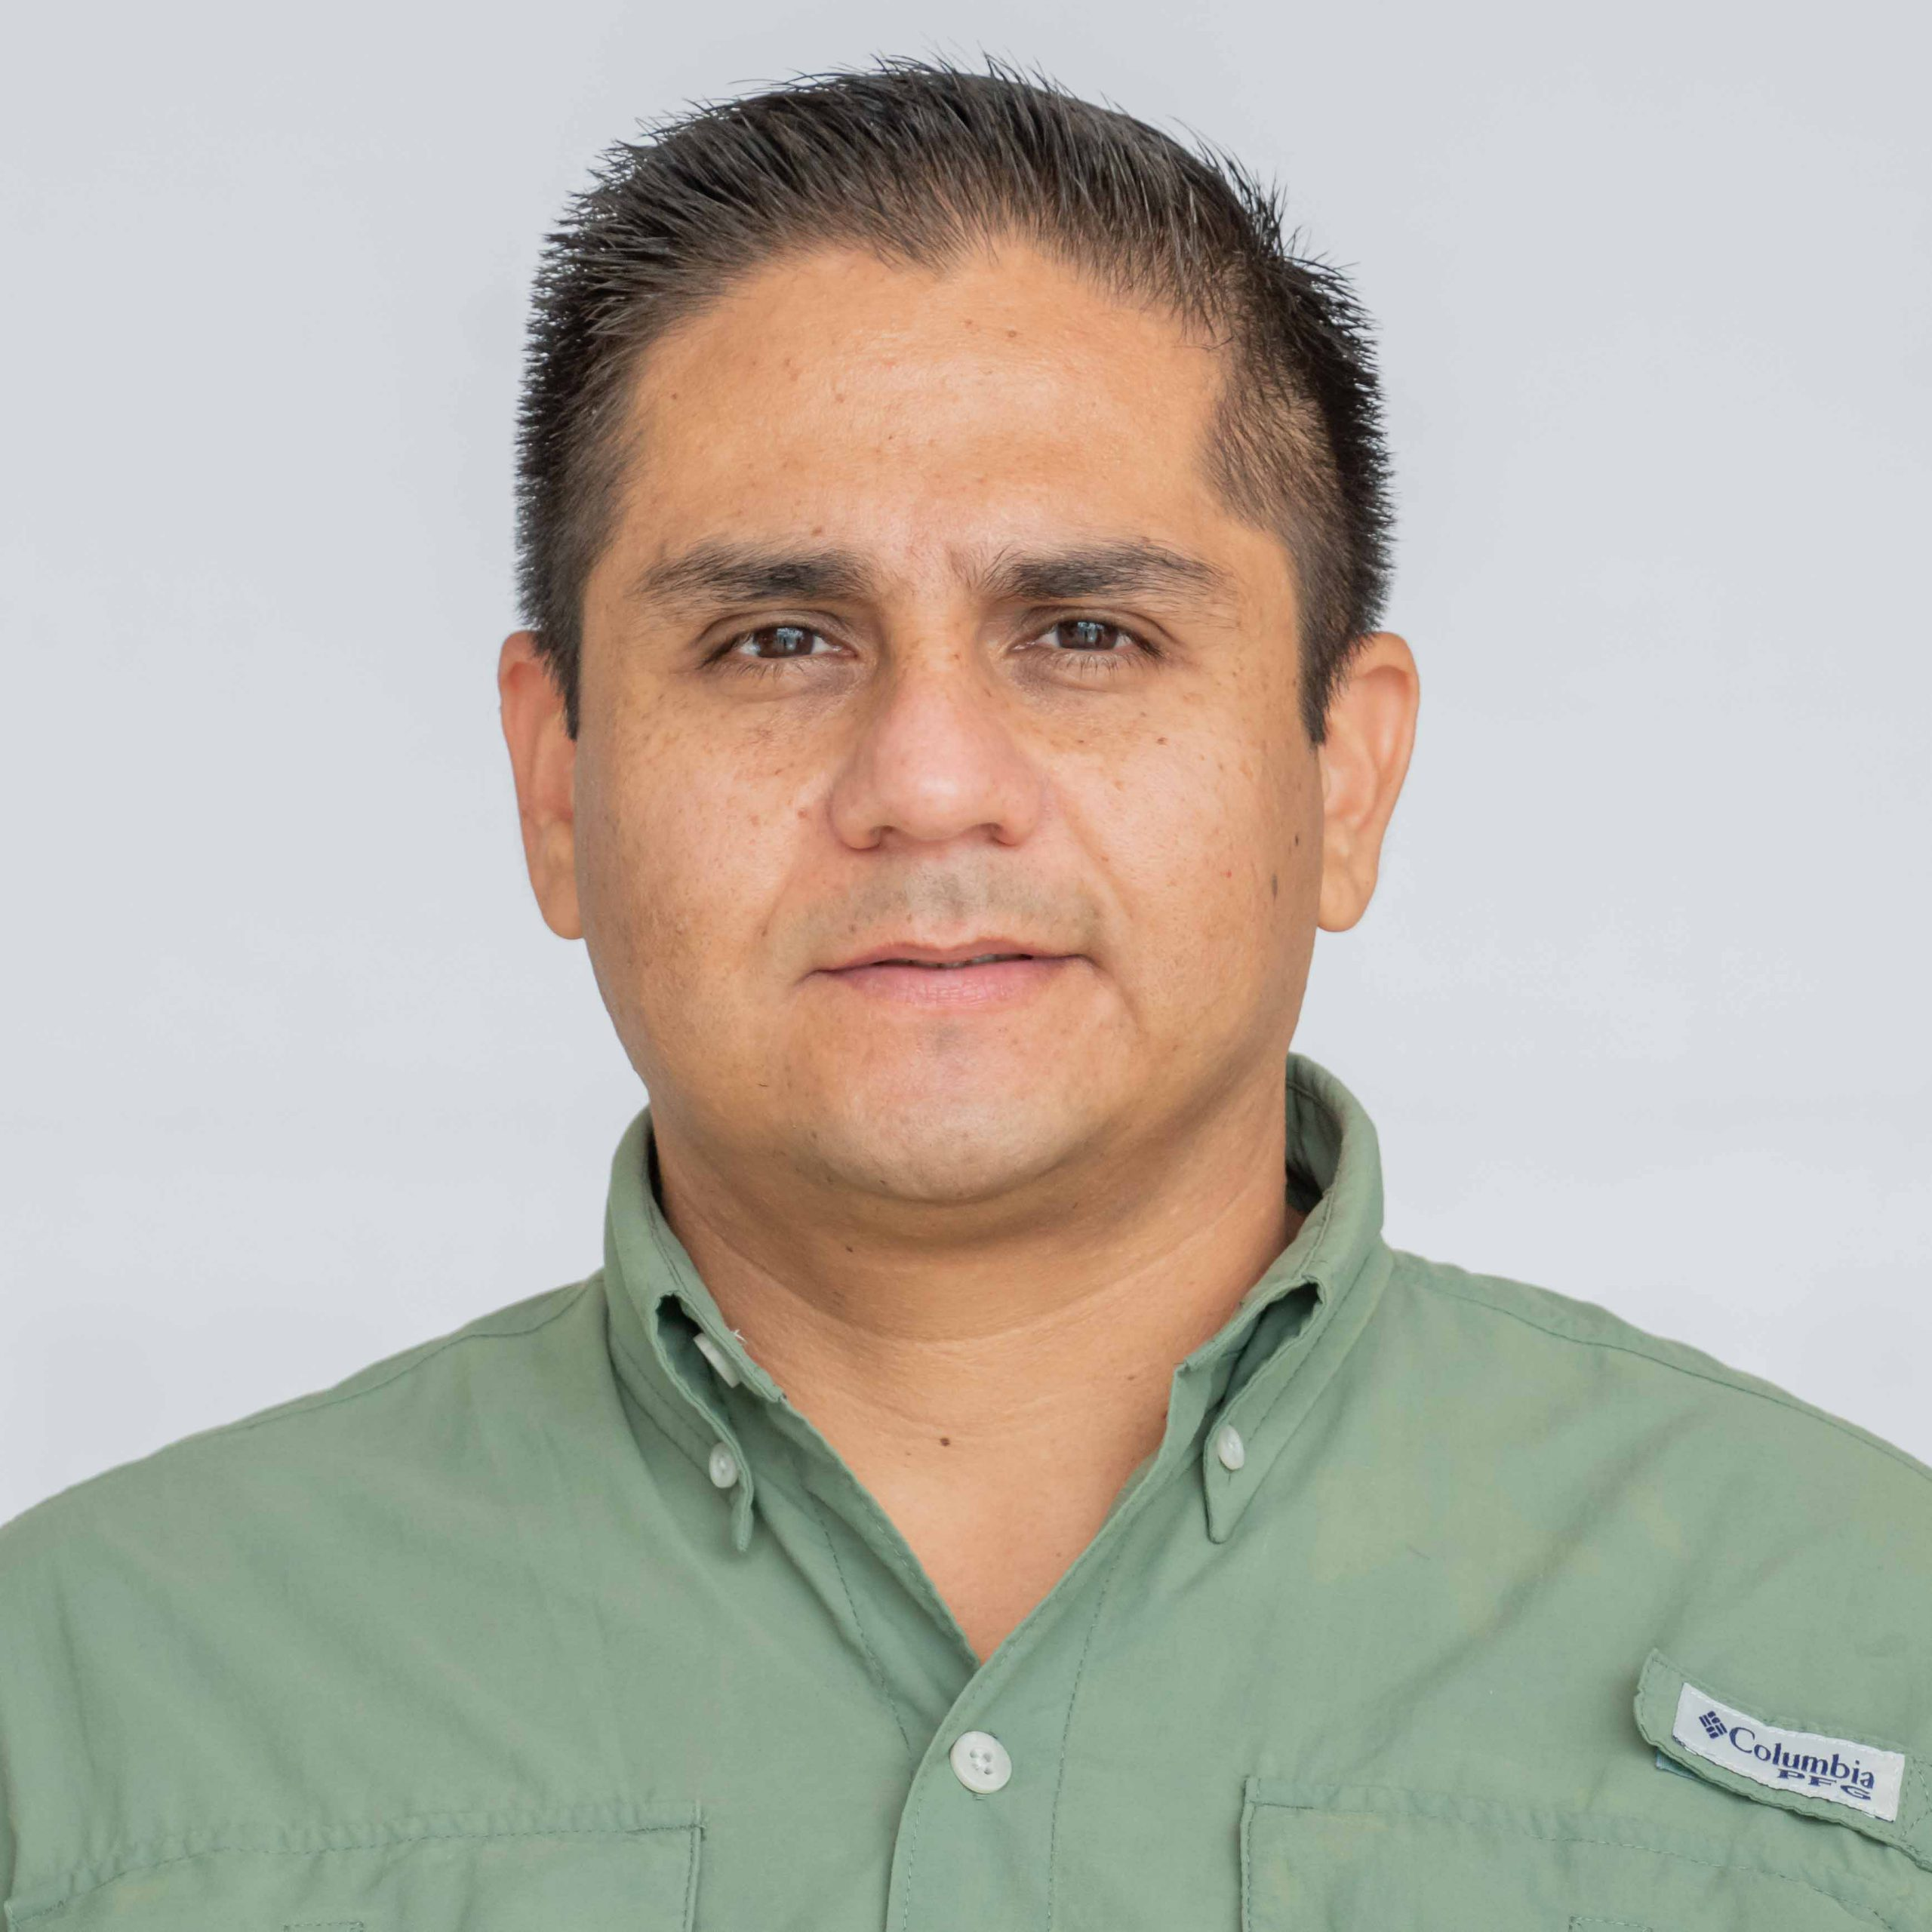 https://congresogro.gob.mx/63/inicio/wp-content/uploads/2021/09/joaquin-badillo-scaled.jpg